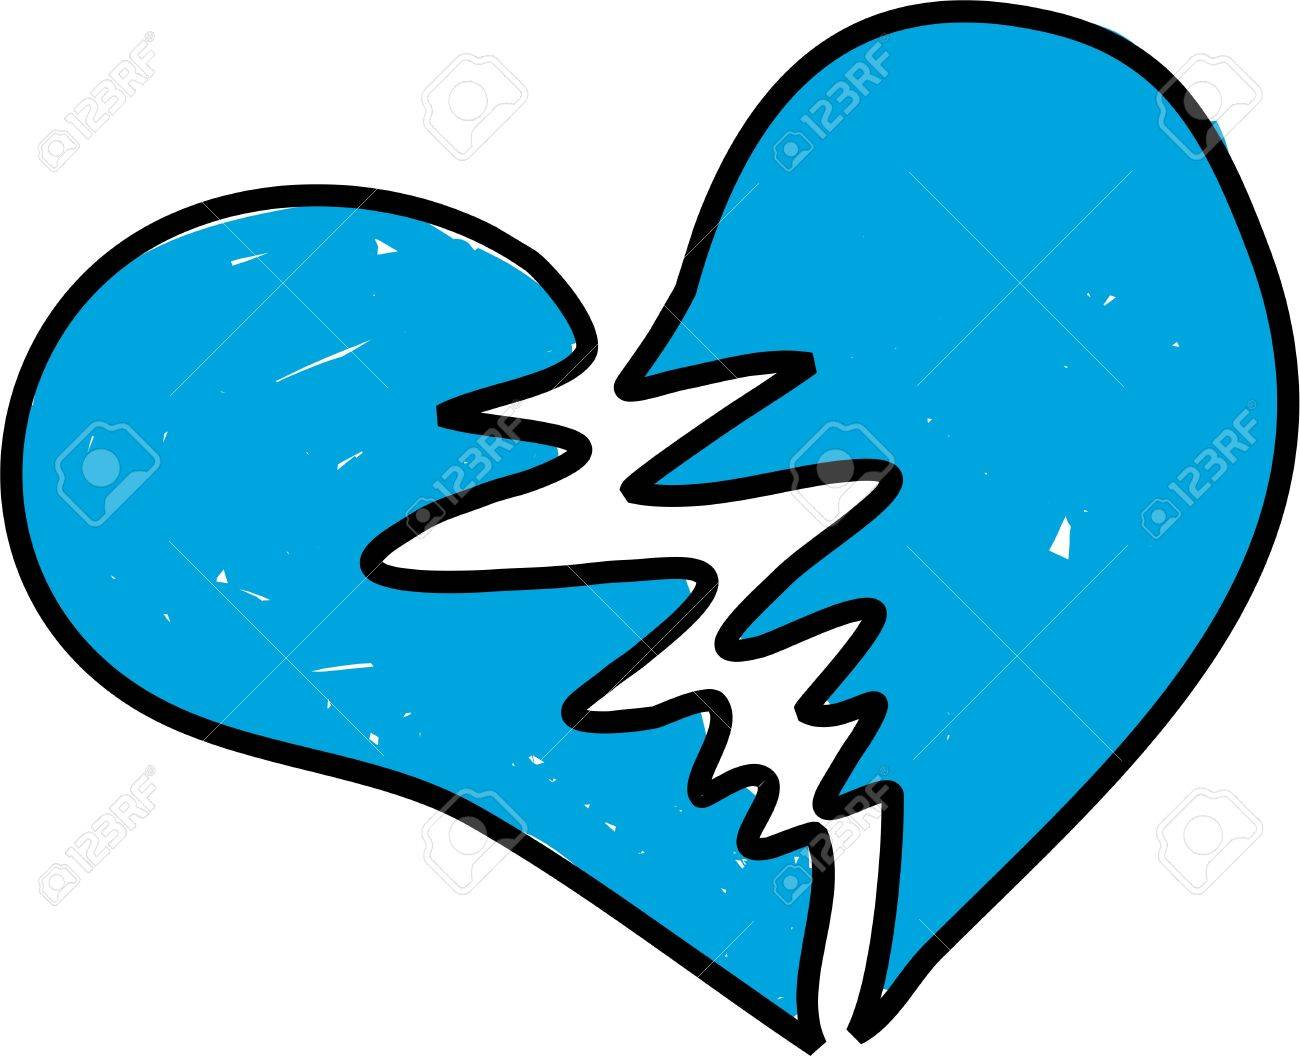 Teal Heart Clip Art clip art brake broken and